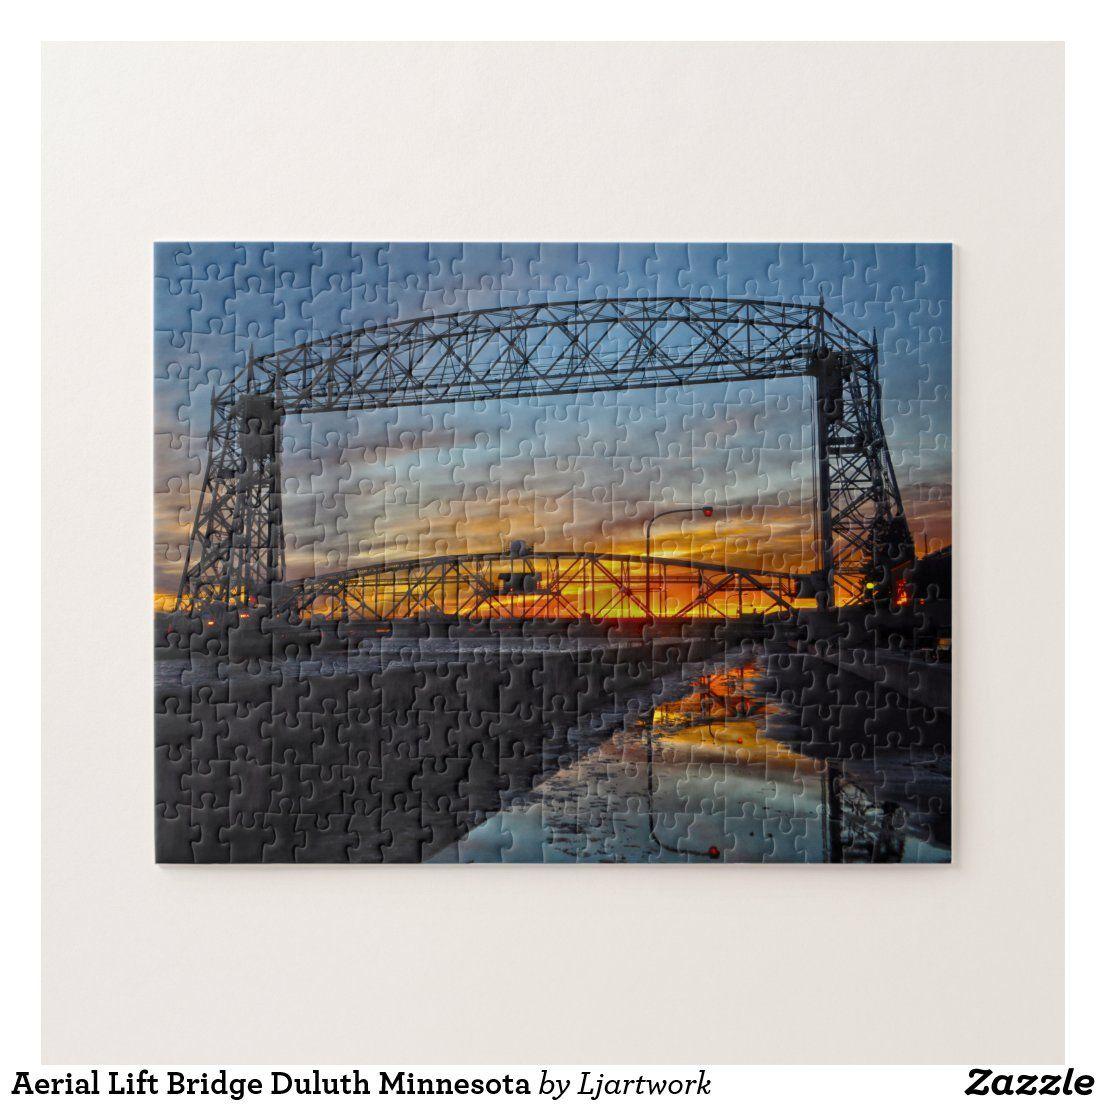 Aerial Lift Bridge Duluth Minnesota Jigsaw Puzzle Zazzle Com In 2020 Aerial Lift Duluth Minnesota Duluth